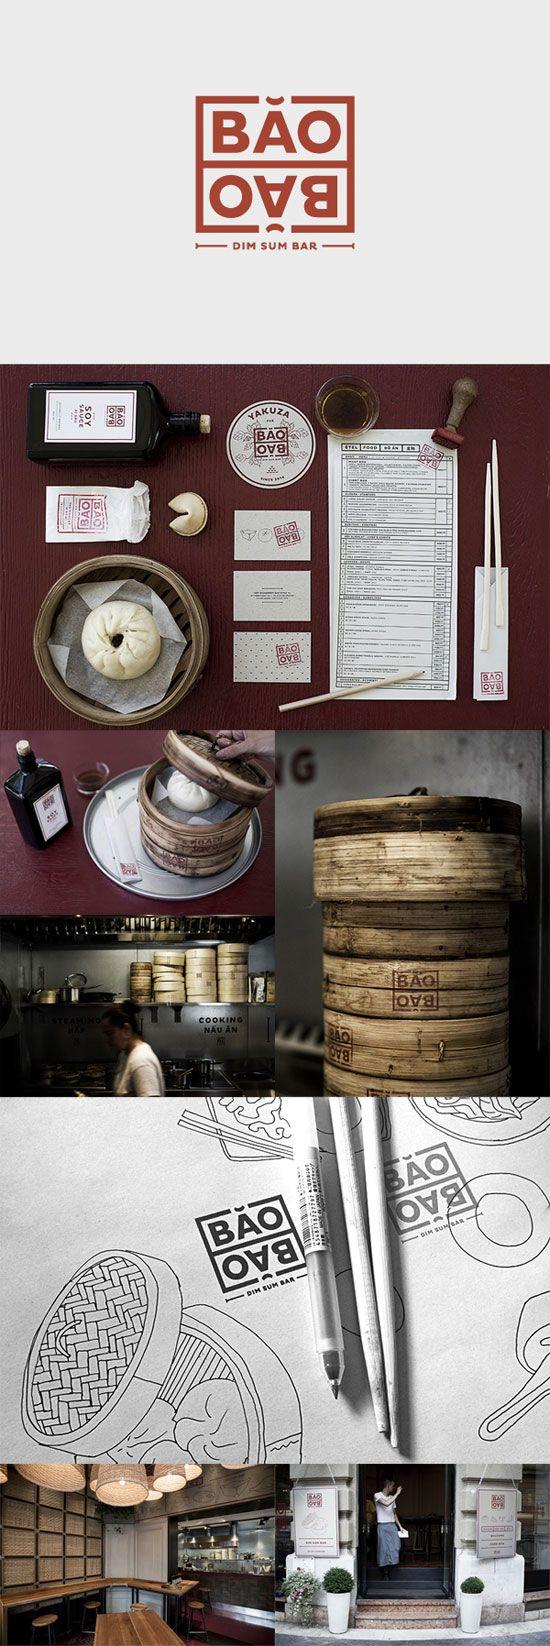 55 Brand Identity Design Examples for Restaurant | iBrandStudio